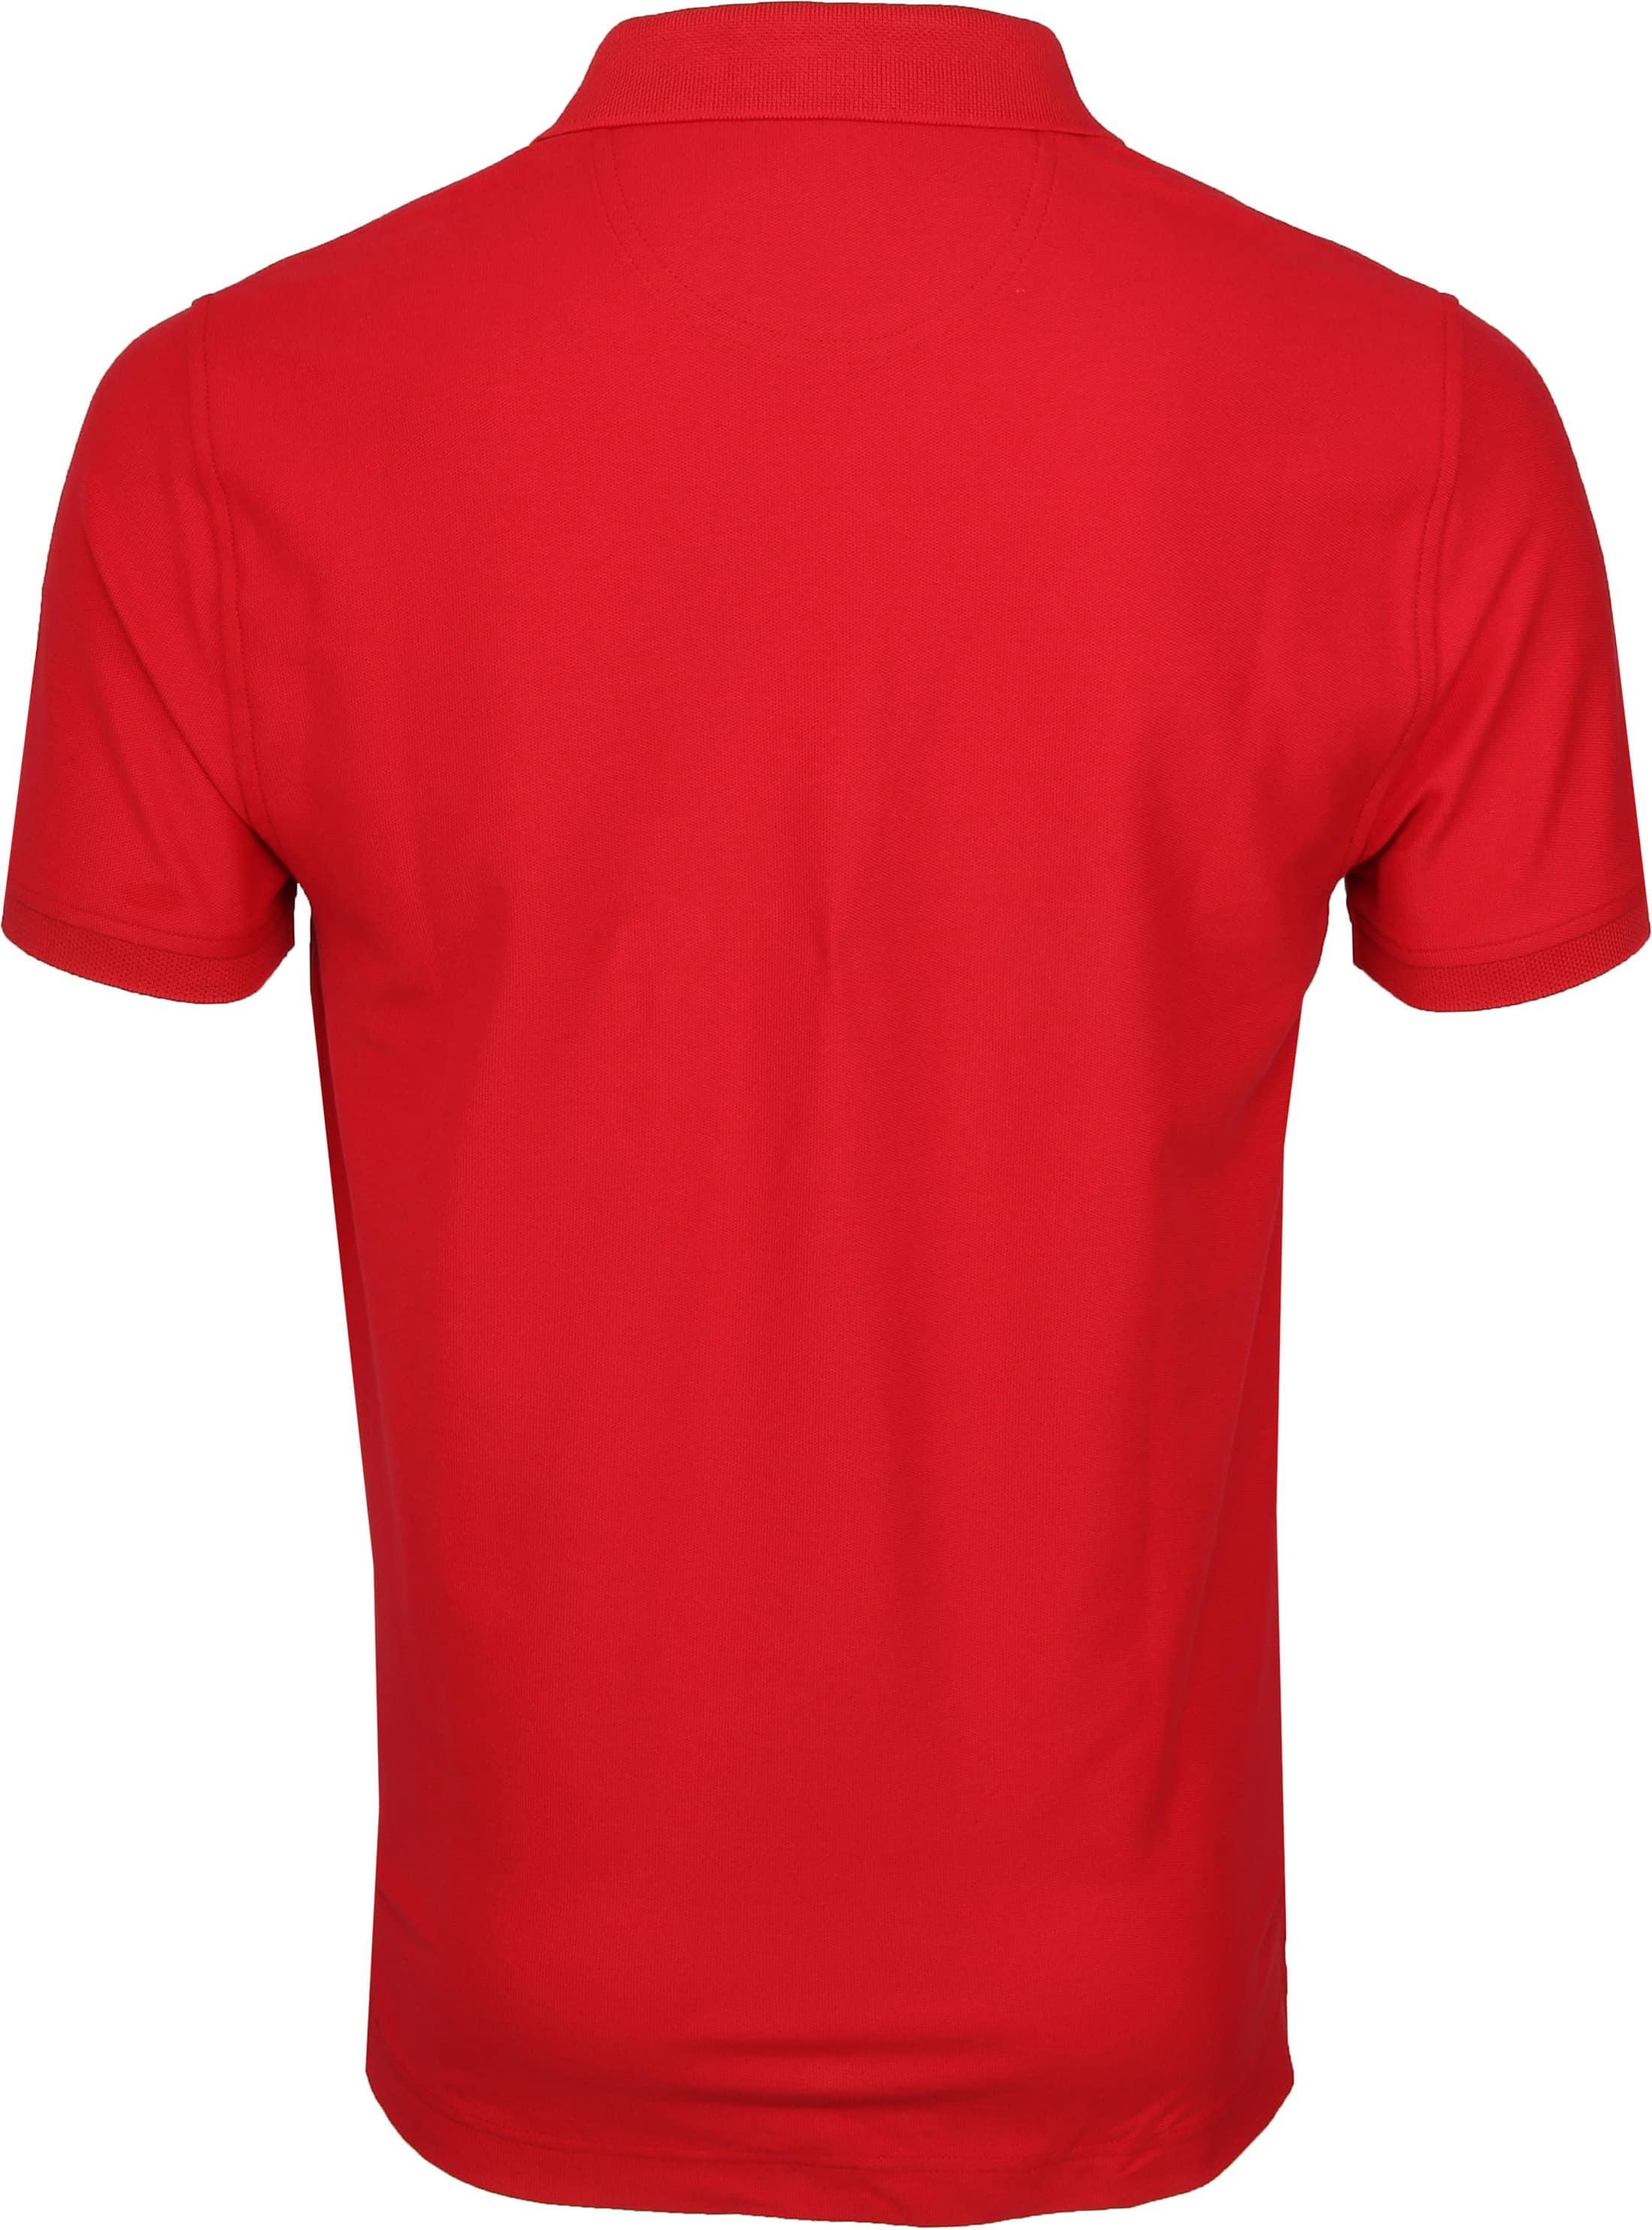 IZOD Performance Poloshirt Red foto 3